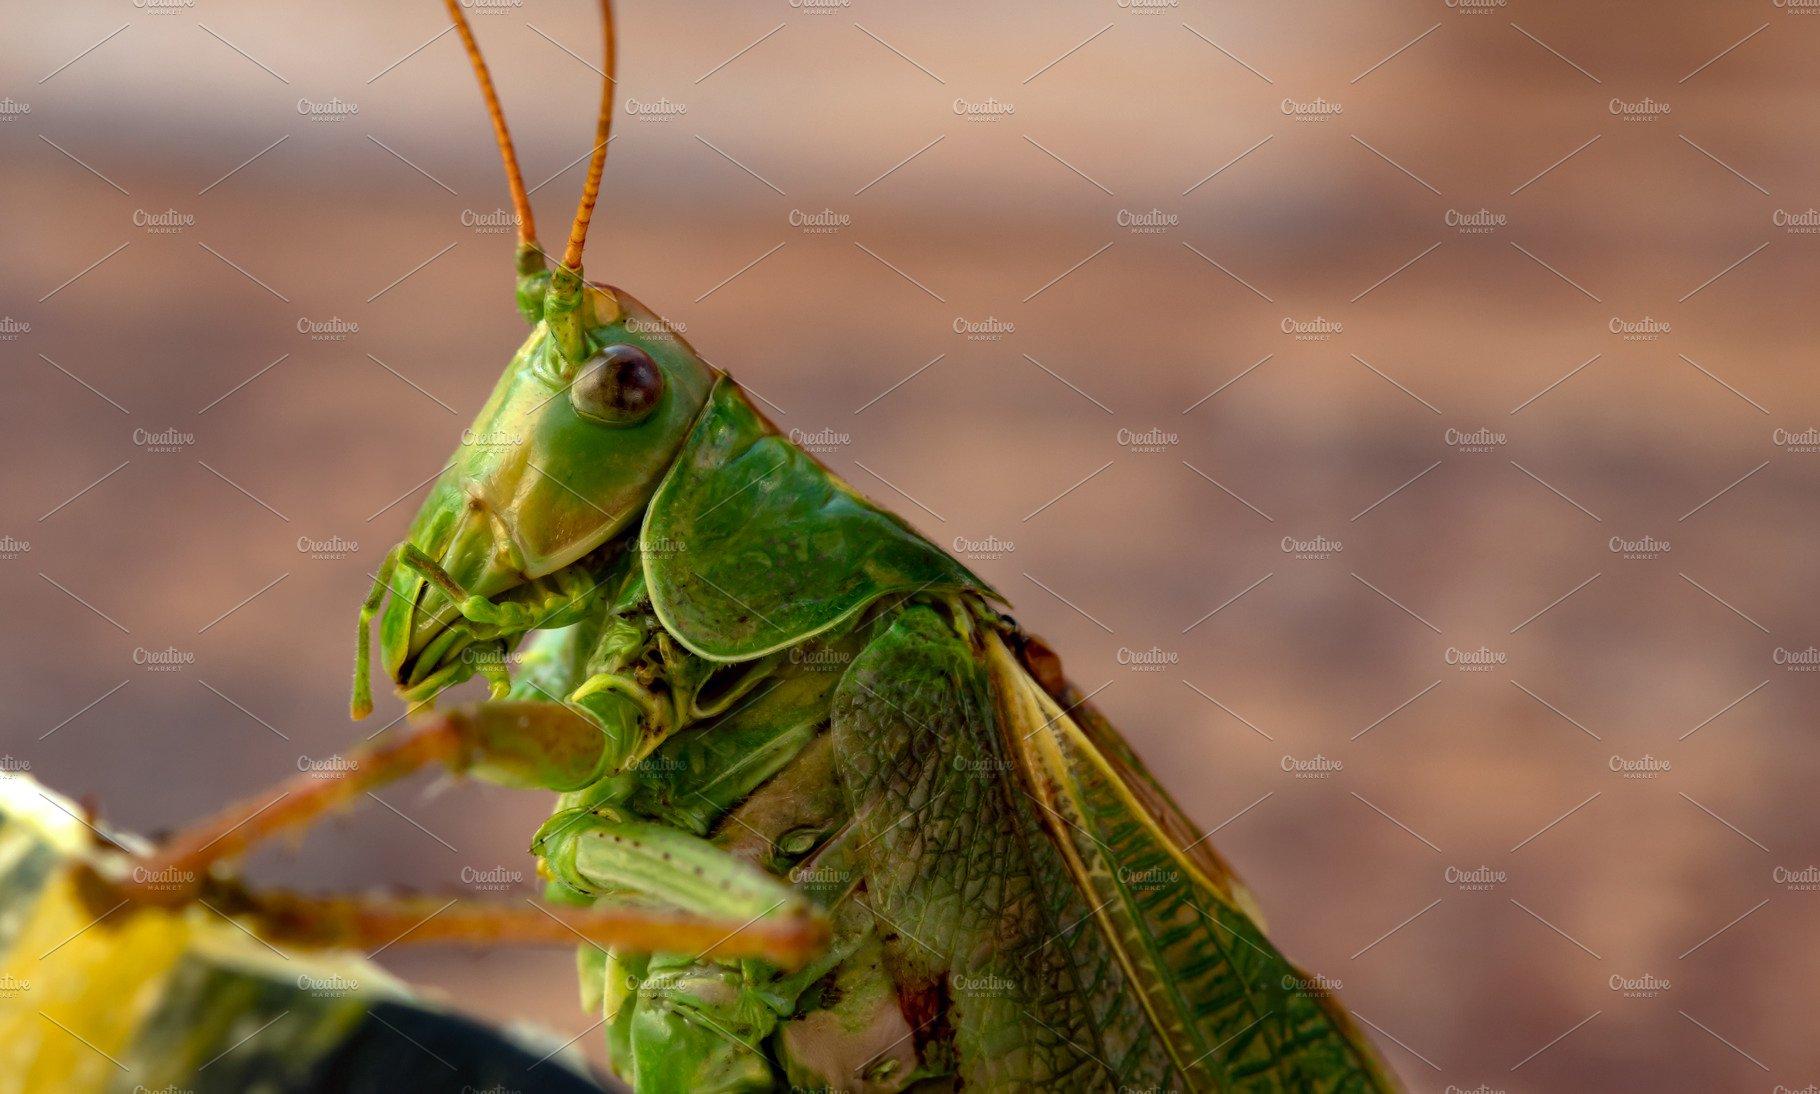 Green garden locust